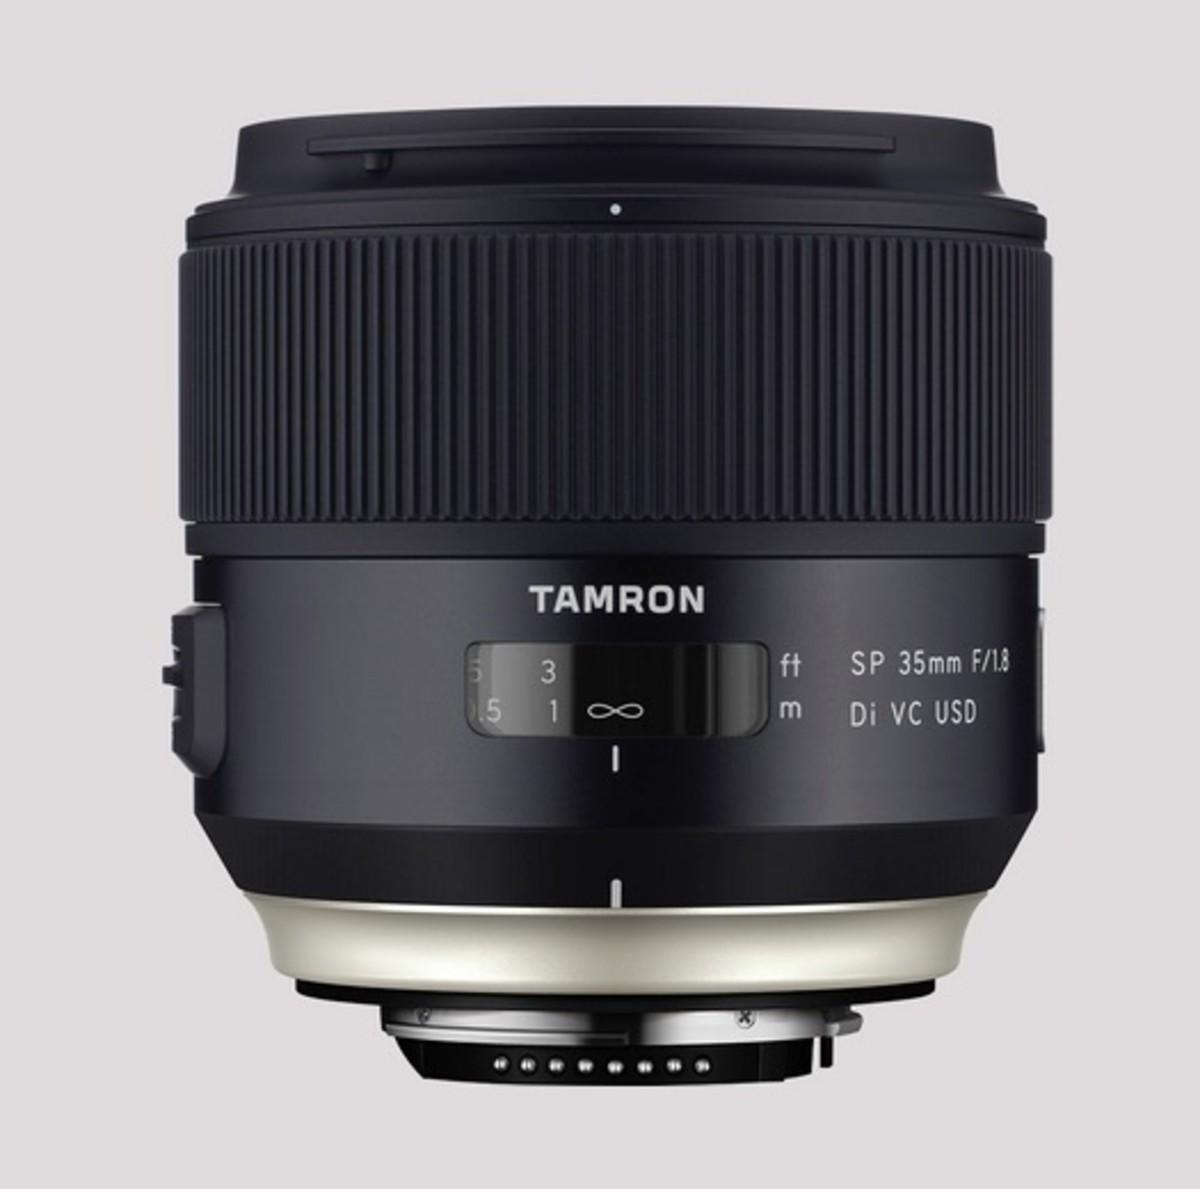 Tamron's New Prime Lens 35mm F1.8